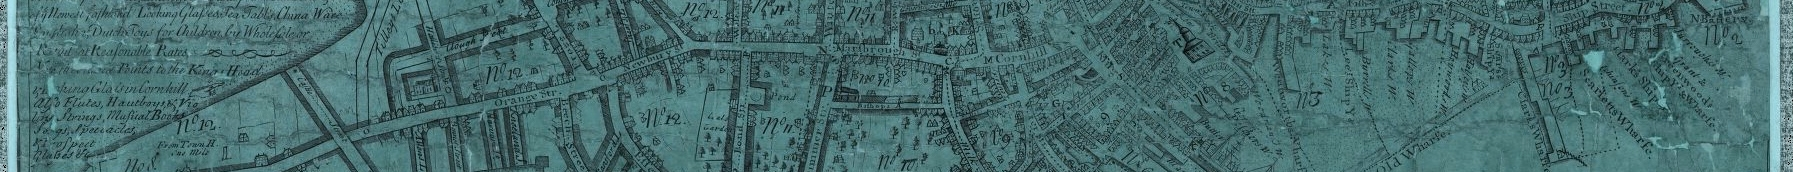 1743 Boston green.jpg